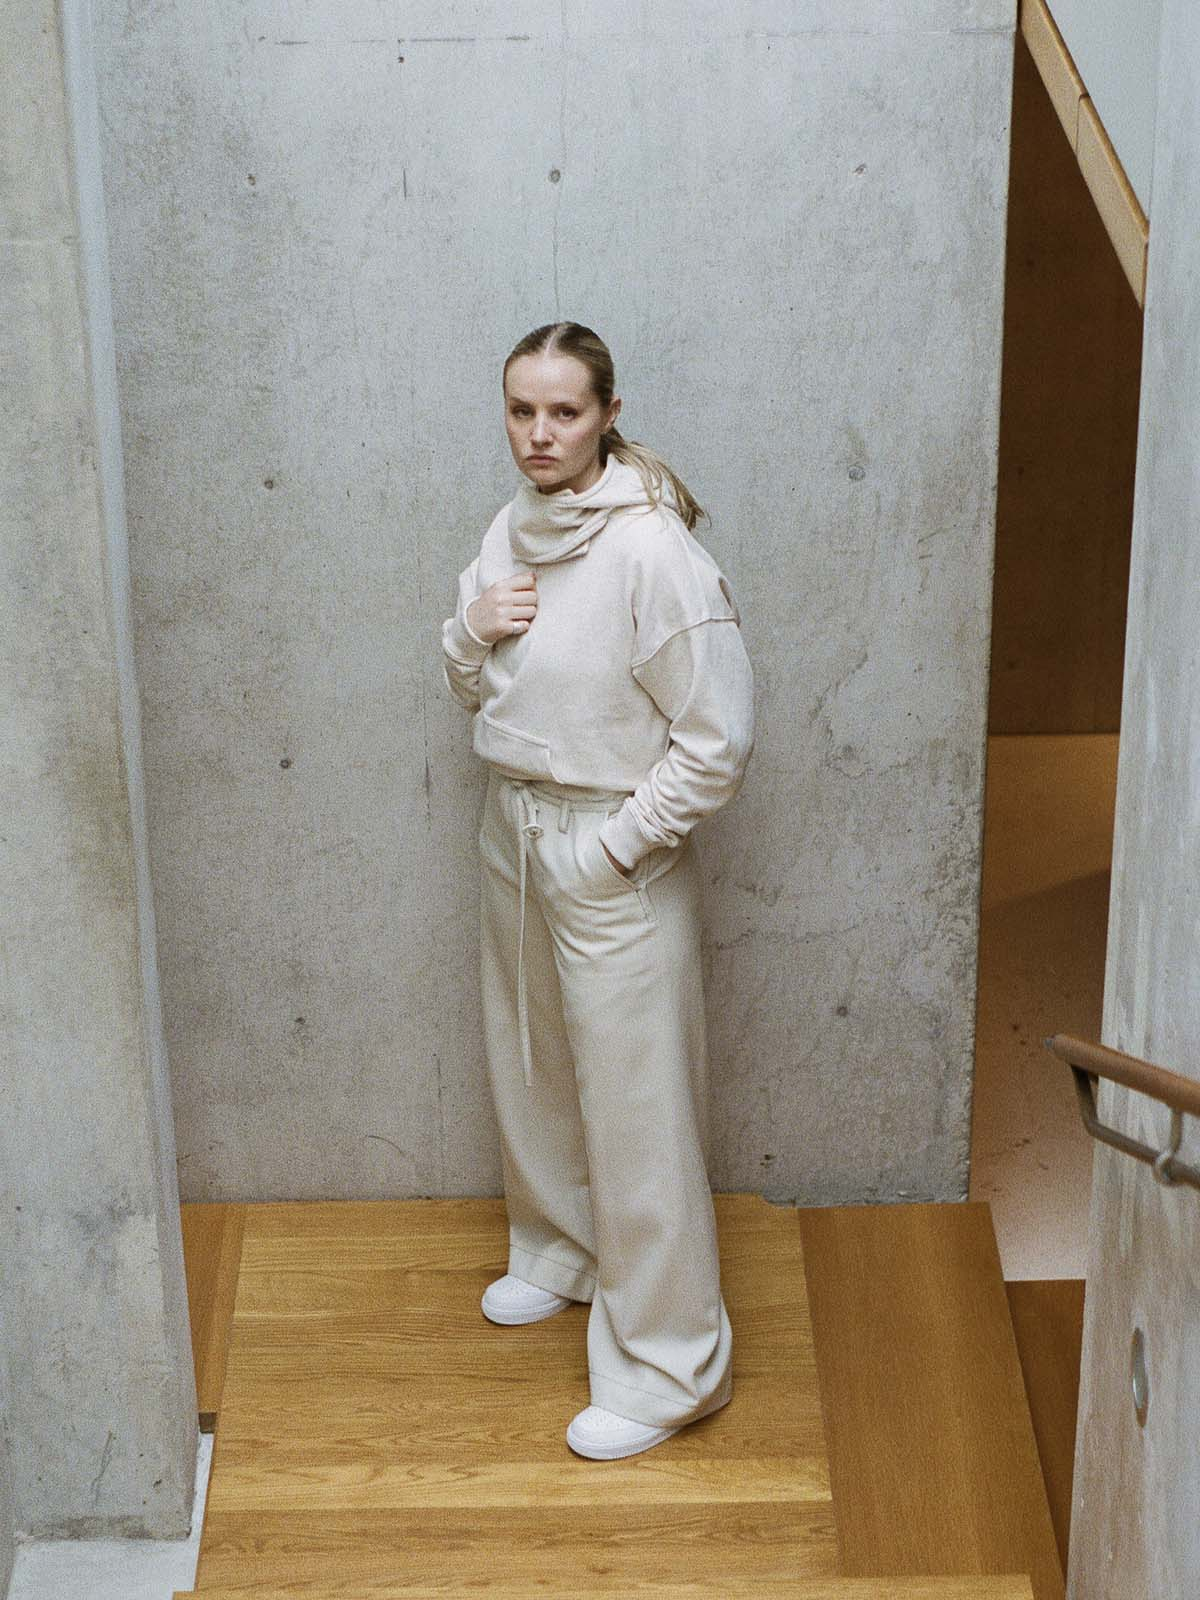 Charlotte Day Wilson finds a rhythm in the unfamiliar